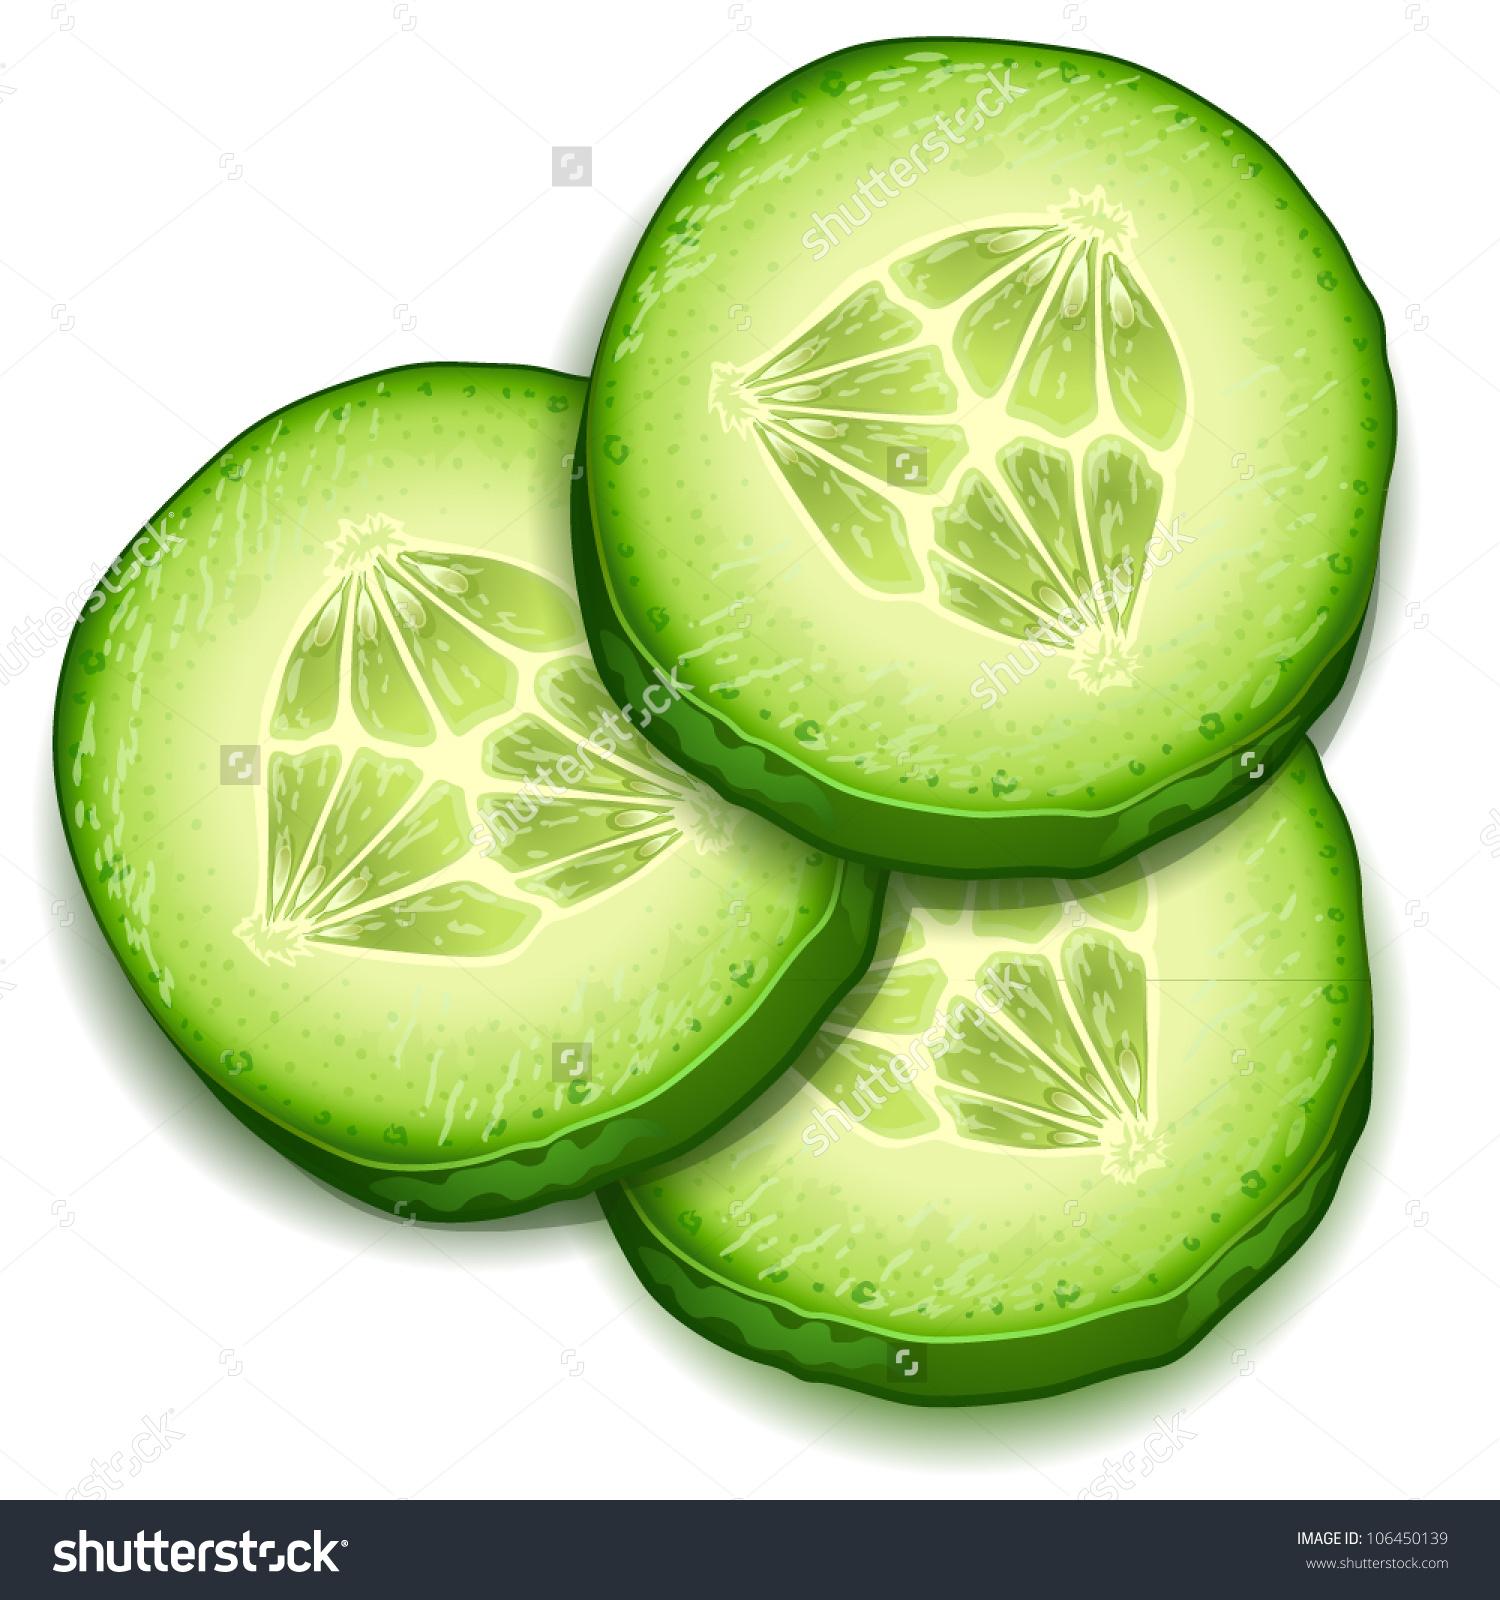 Cucumber slice clip art.